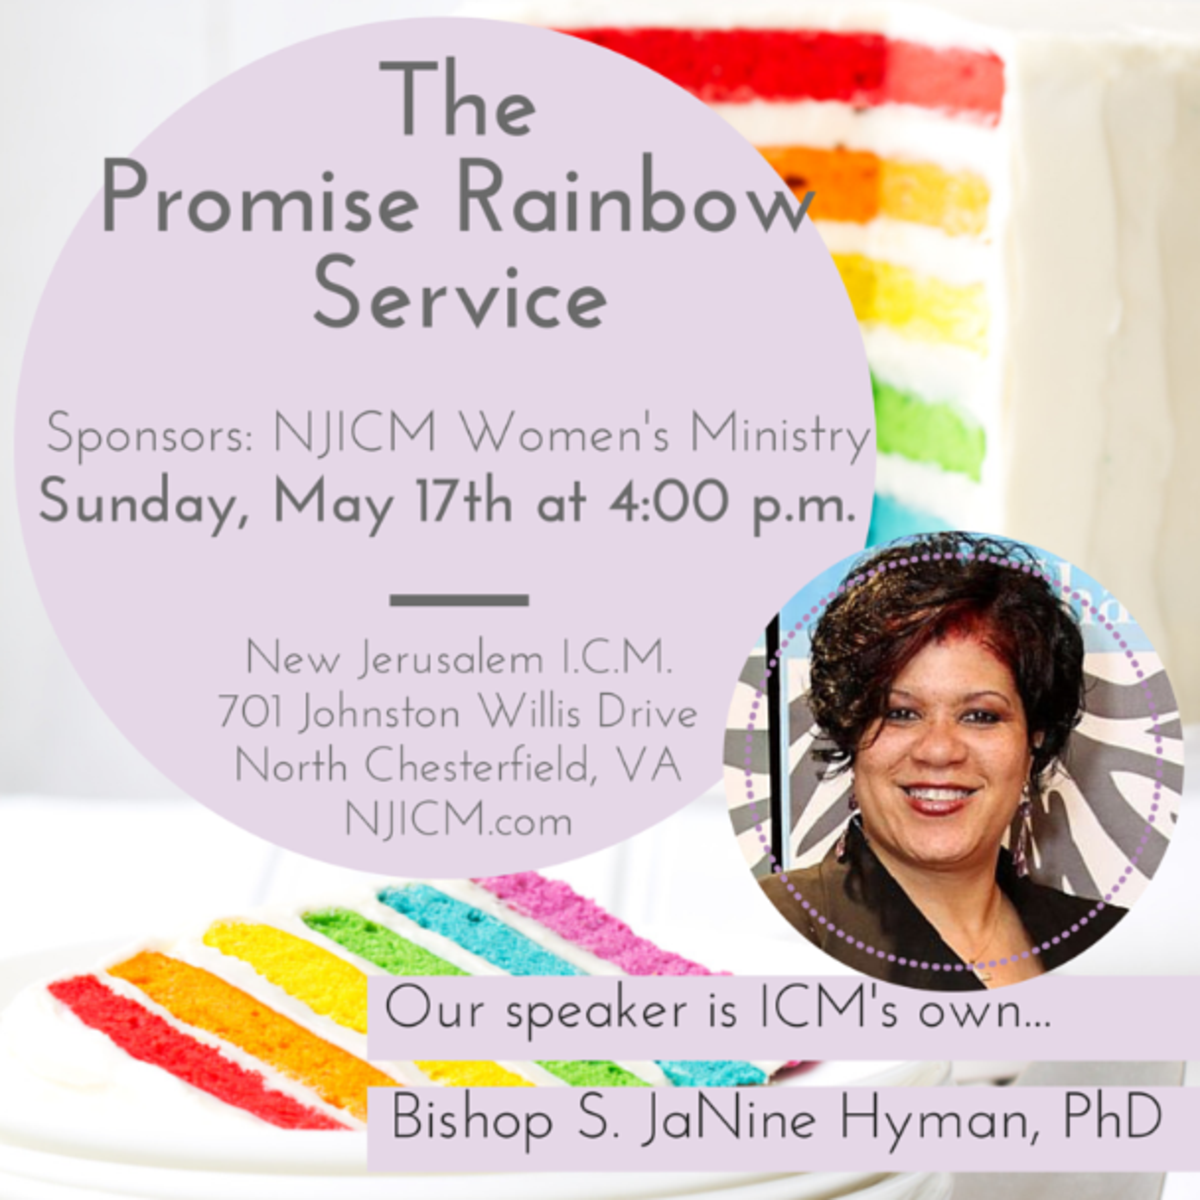 The Promise Rainbow Service